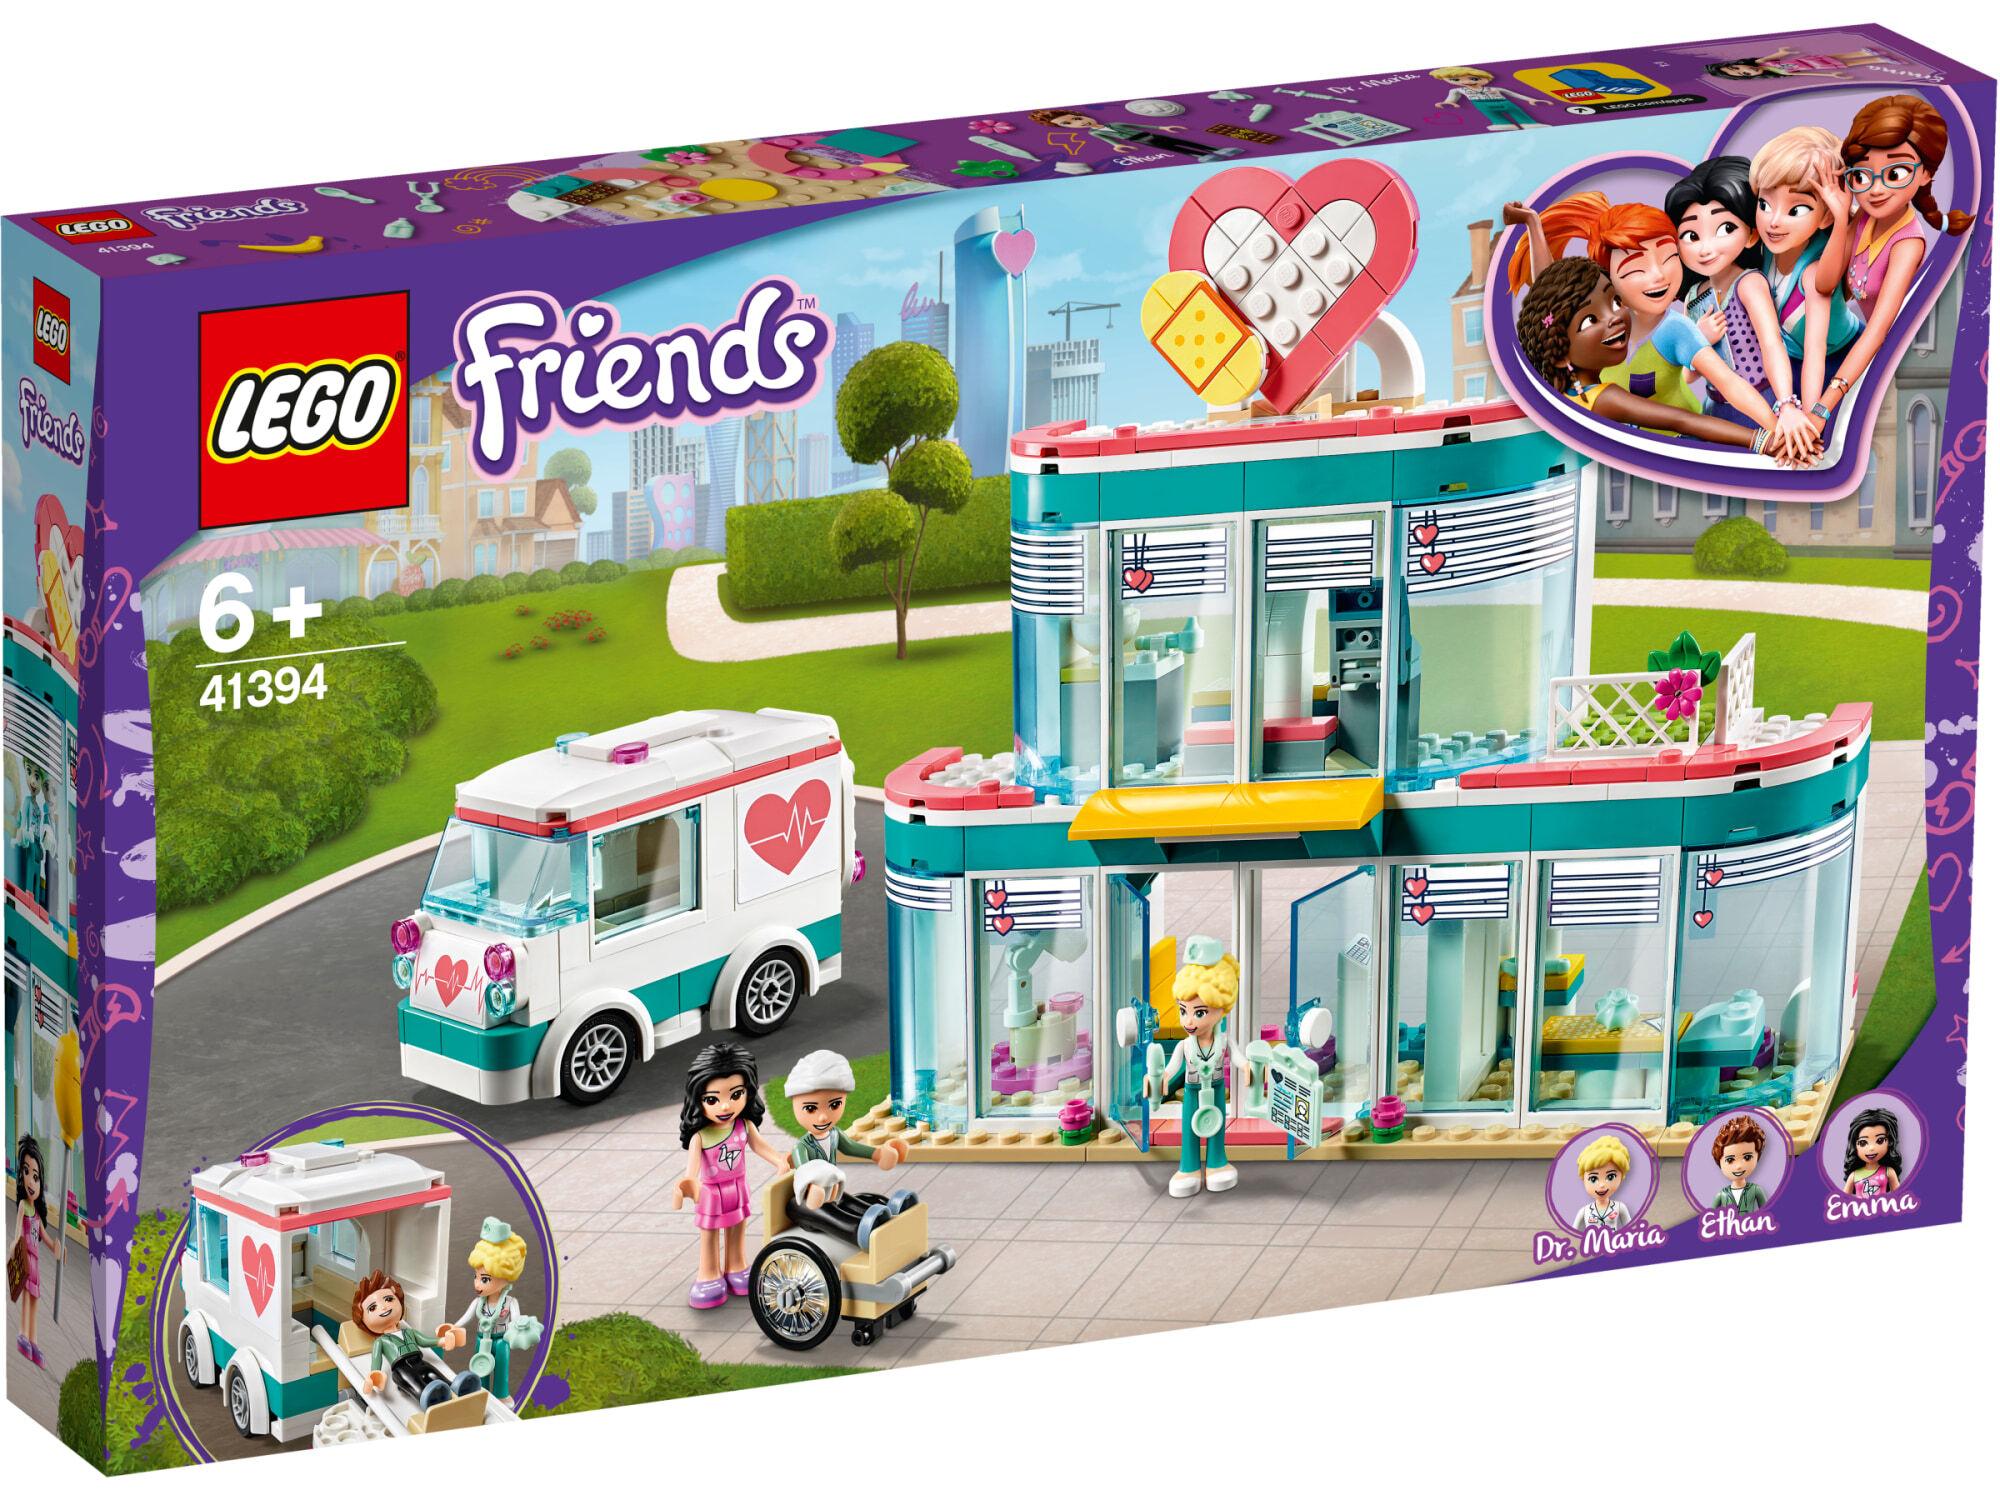 Lego Friends 41394 Heartlake Cityn sairaala